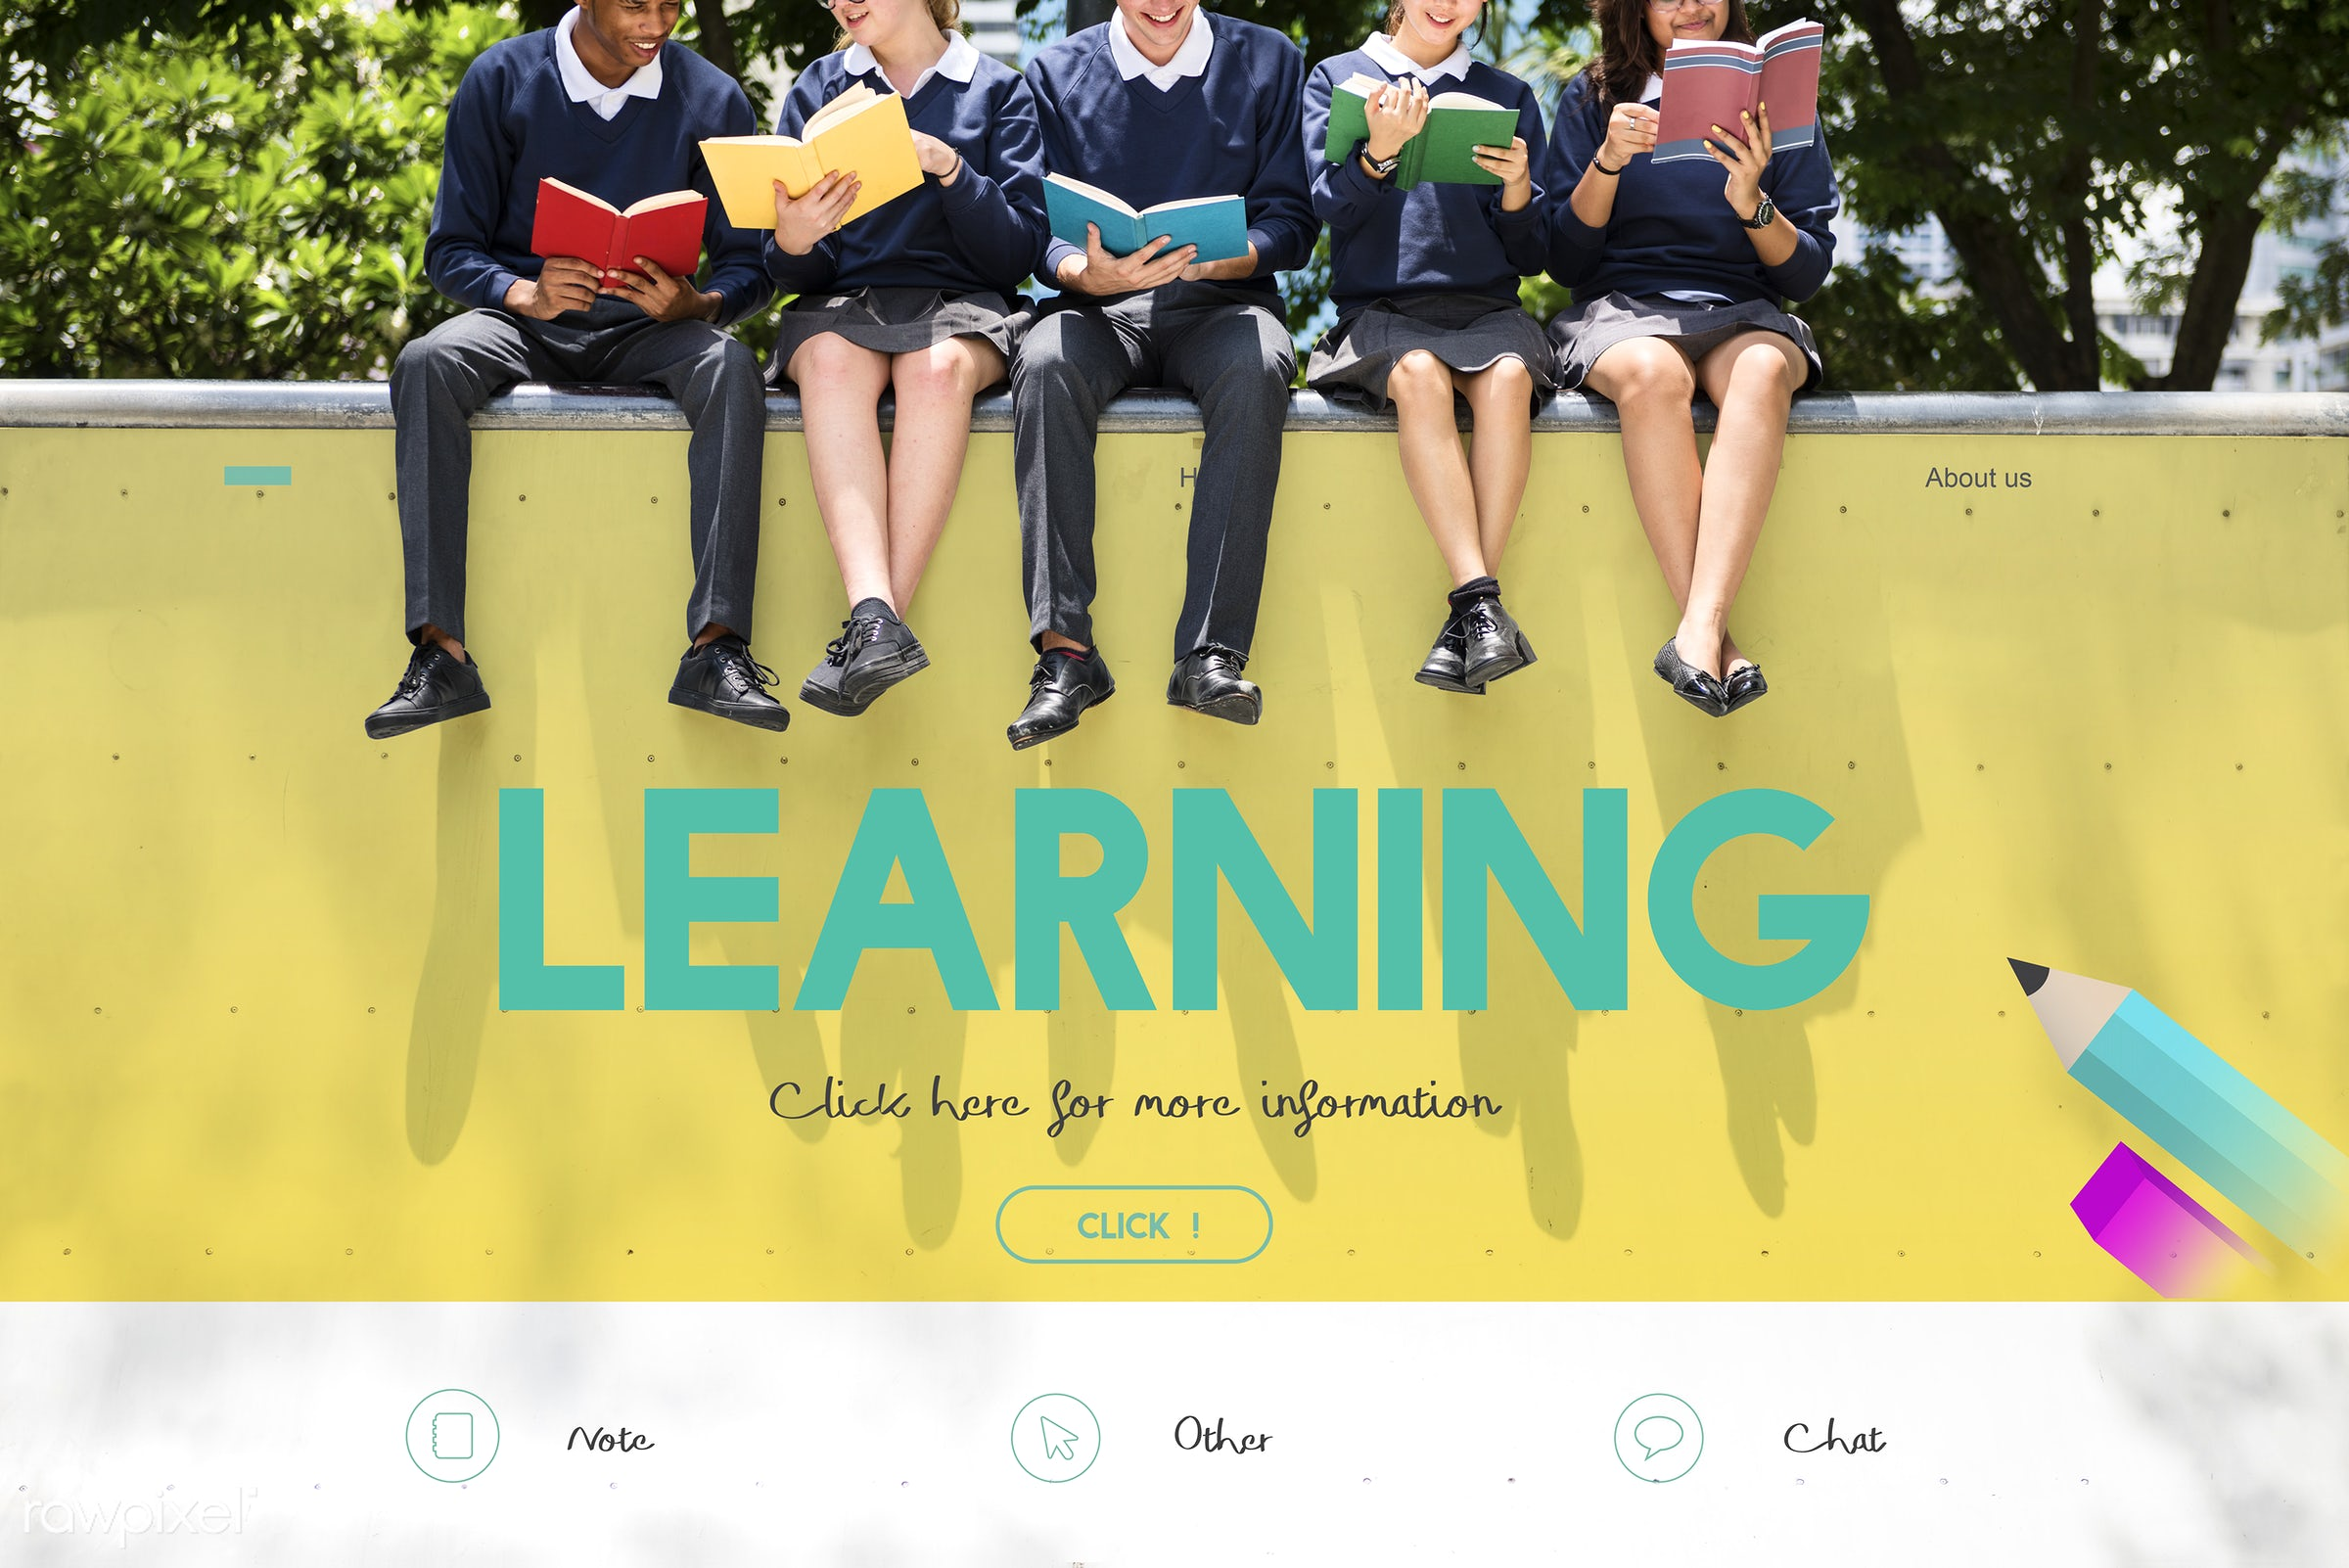 academics, books, class, college, competitive edge, diversity, education, friends, friendship, high school, holding, insight...